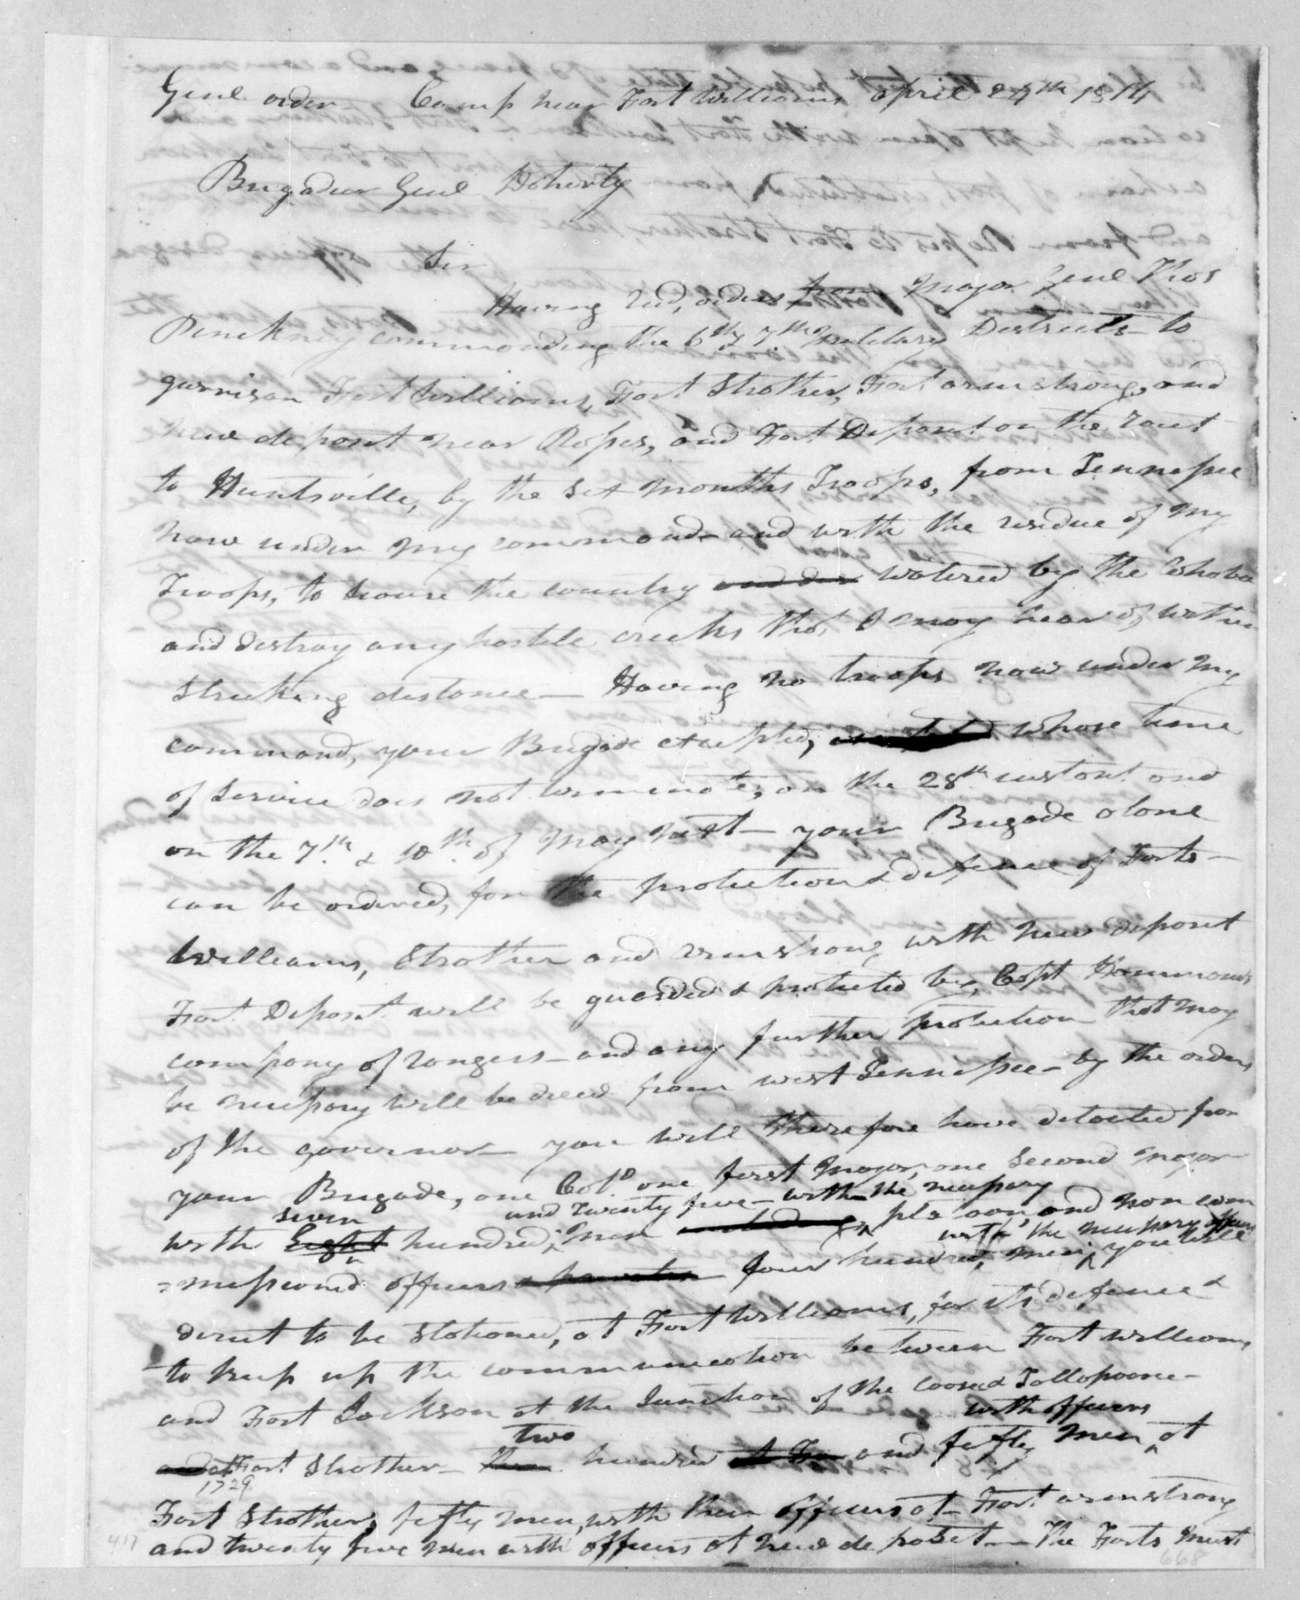 Andrew Jackson to George Doherty, April 24, 1814